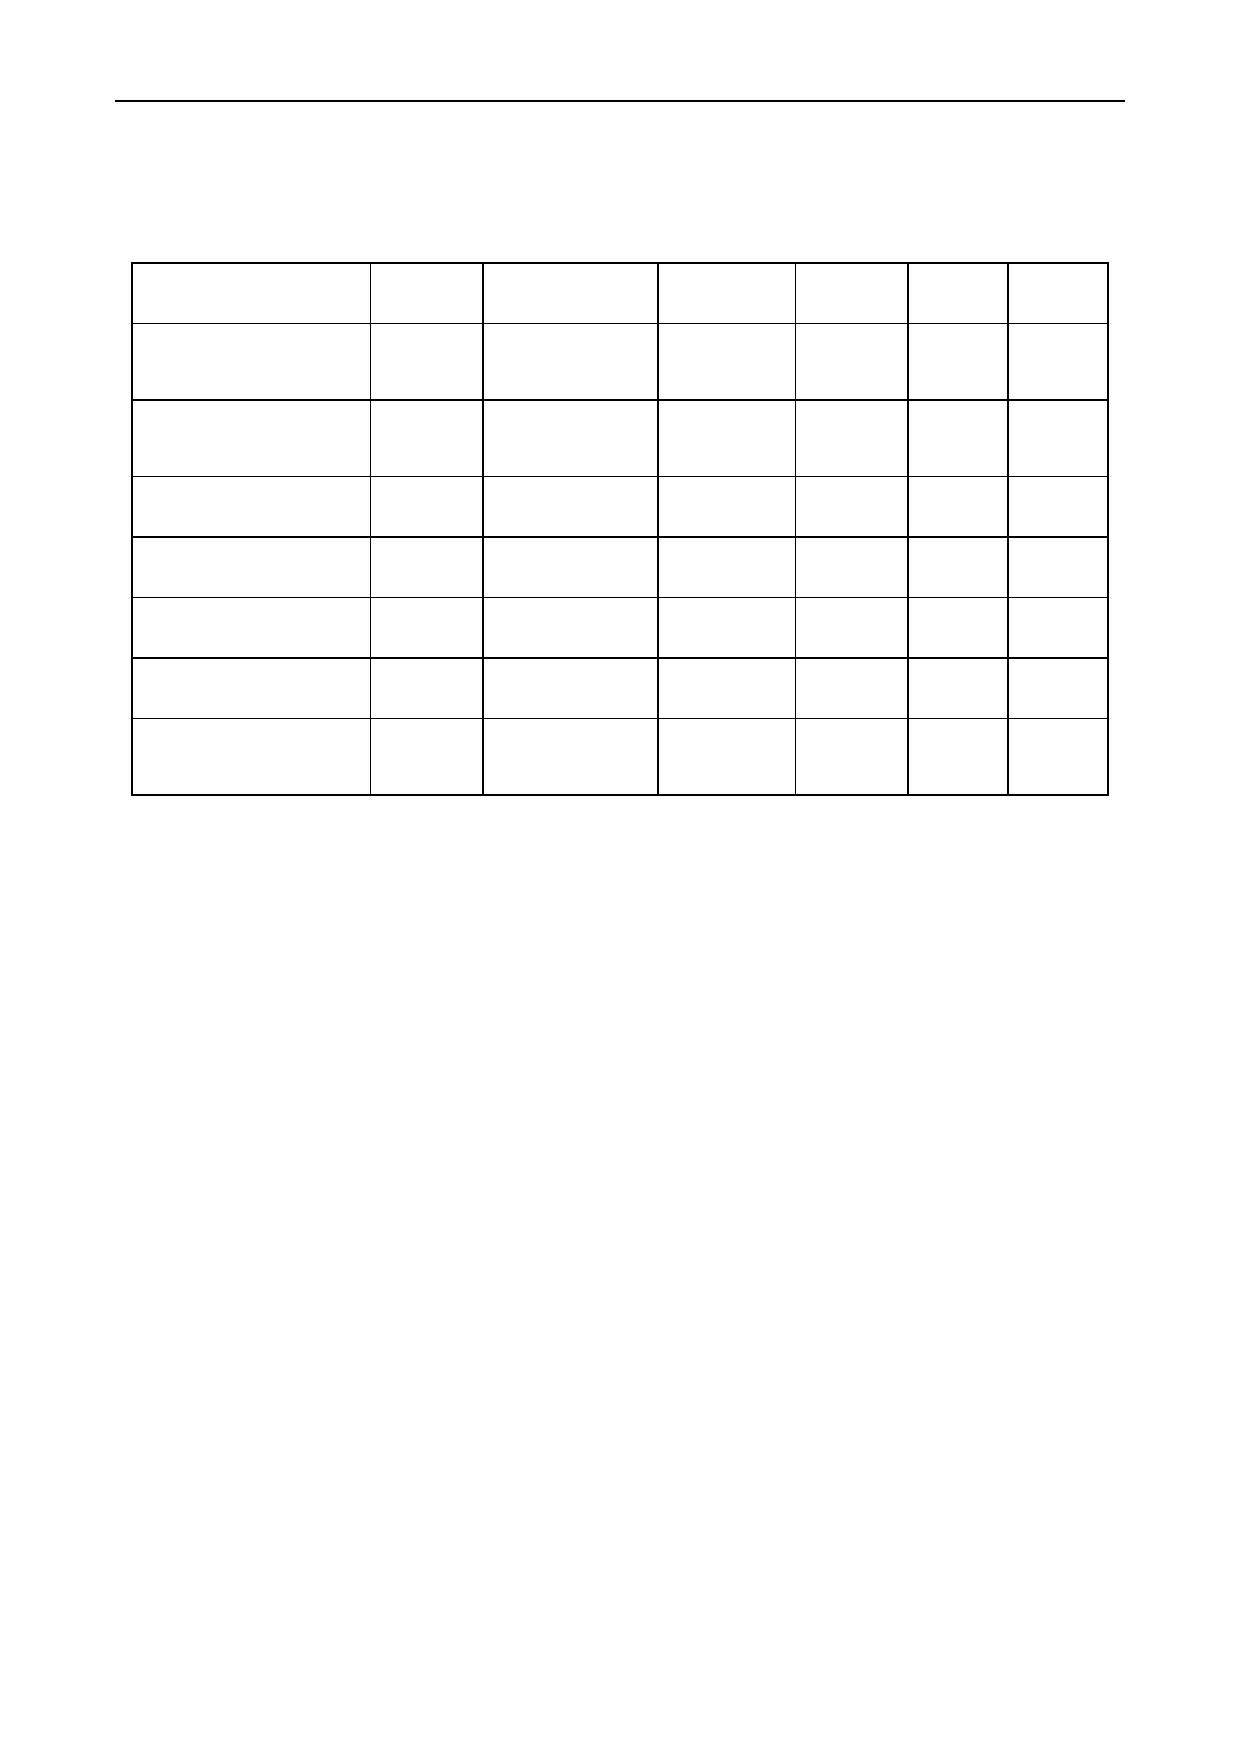 LG128644-SFLYH6V pdf, 반도체, 판매, 대치품